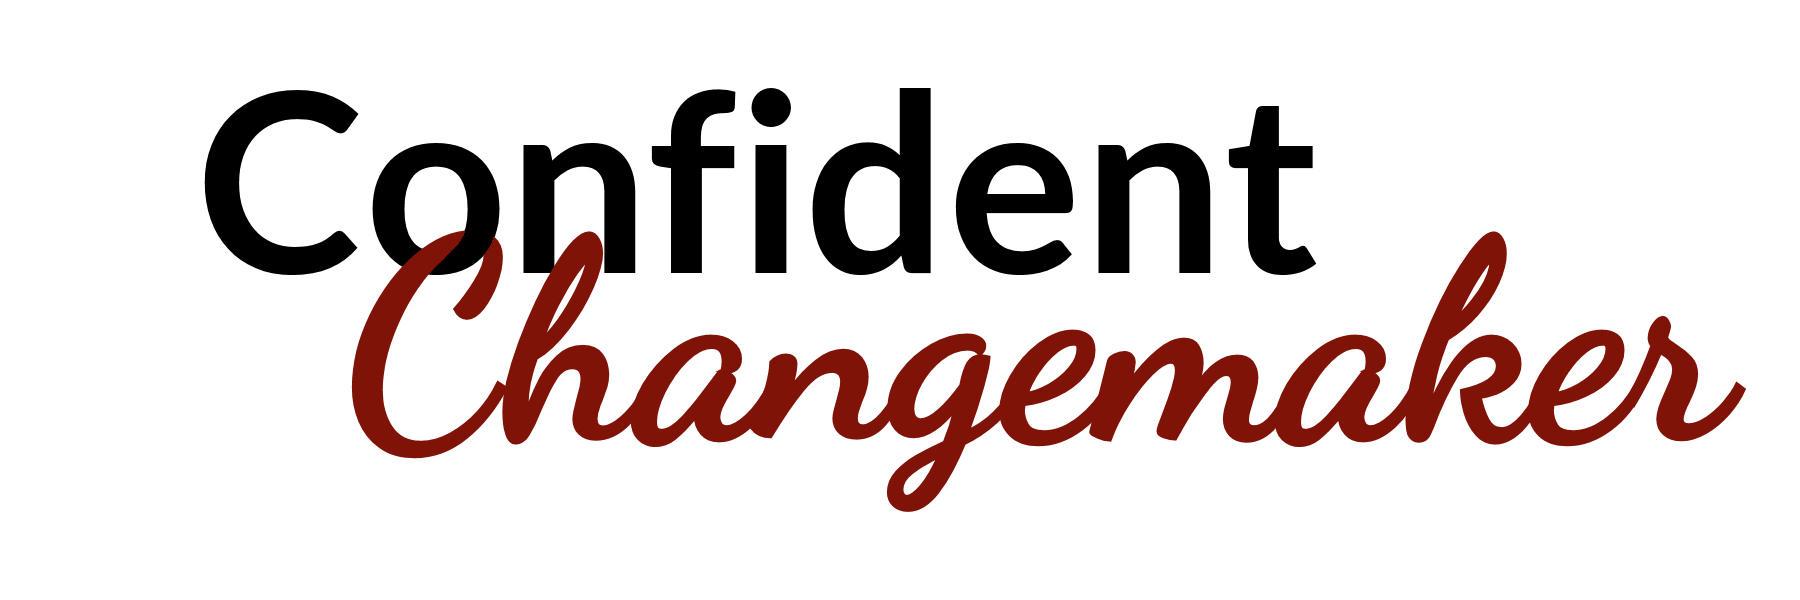 Confident Changemaker